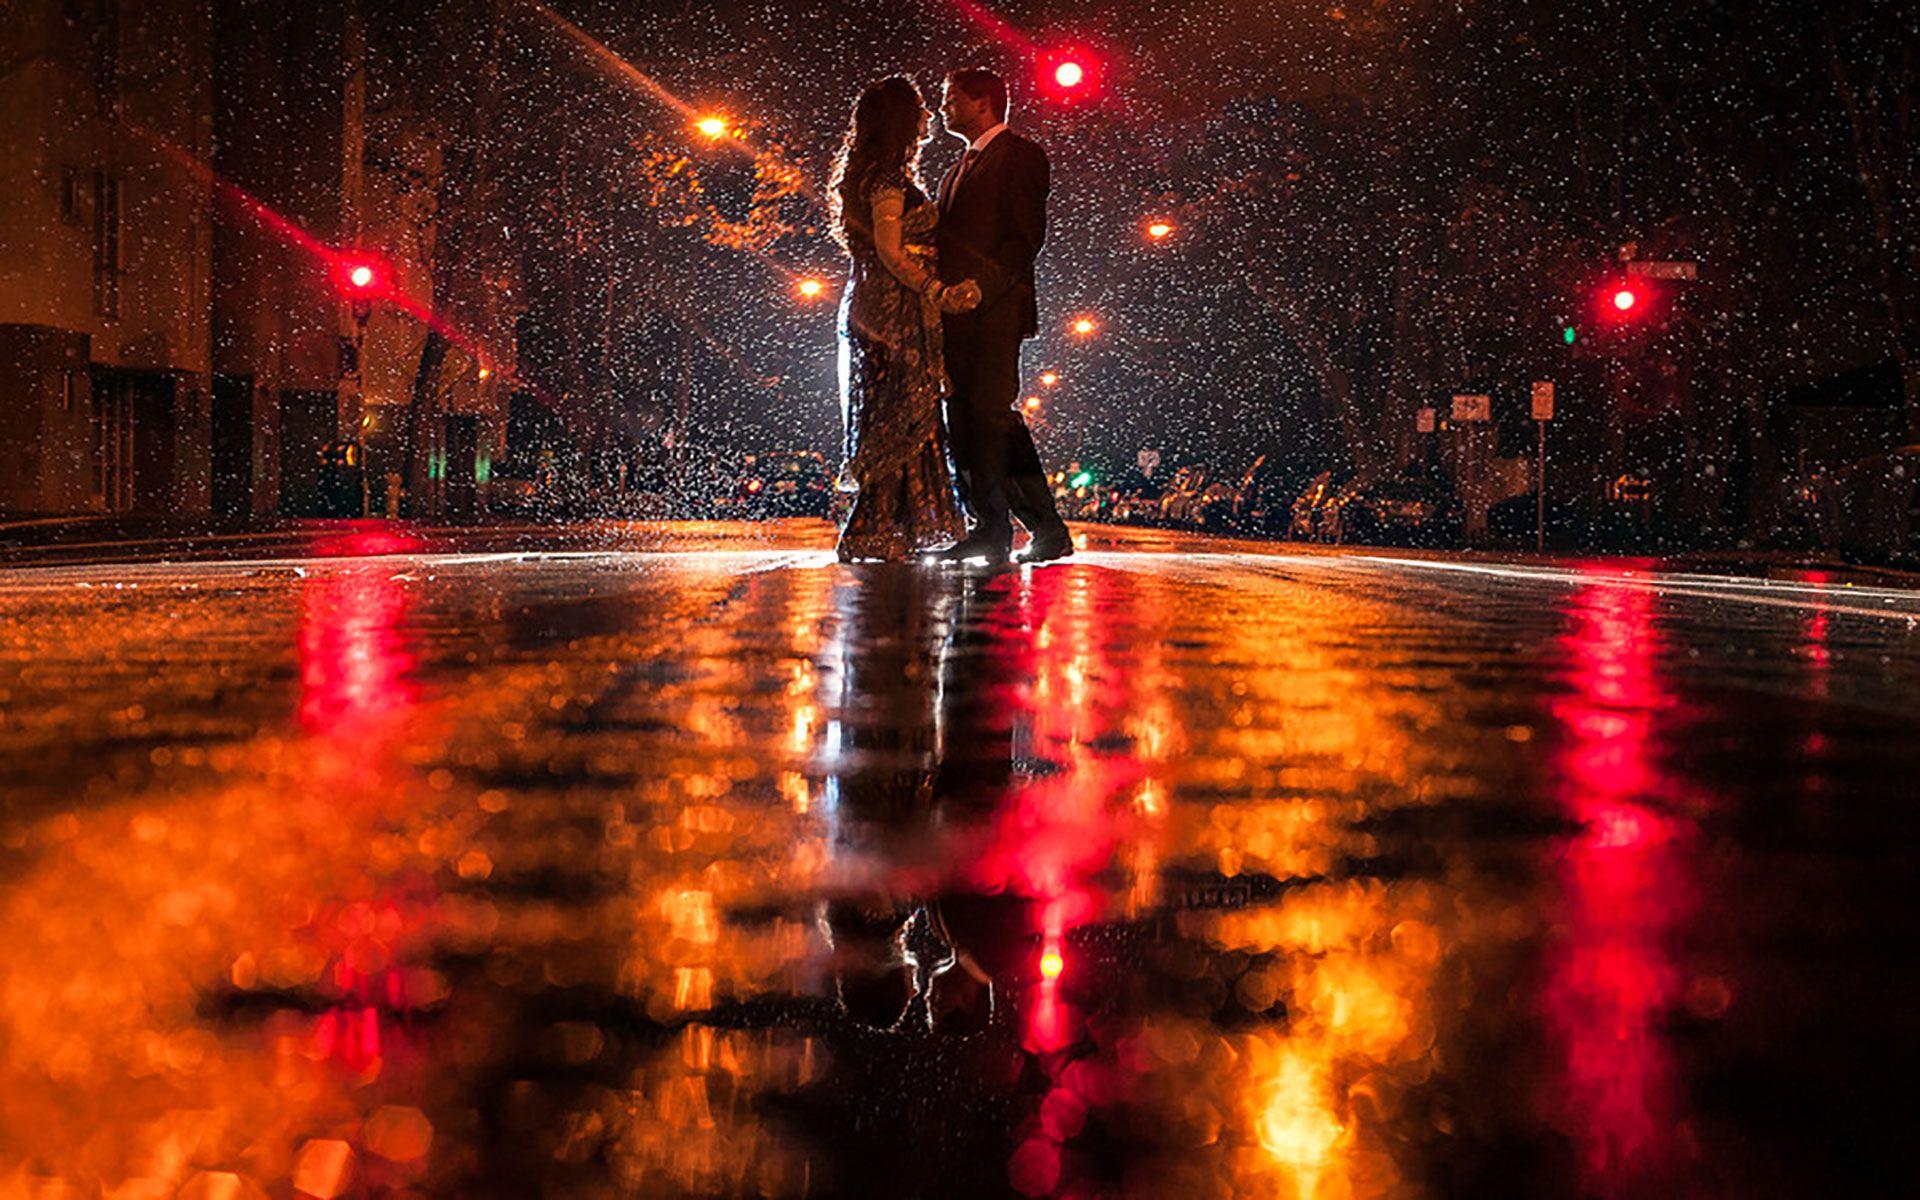 Romance Of Cute Couple In A Rainy Night